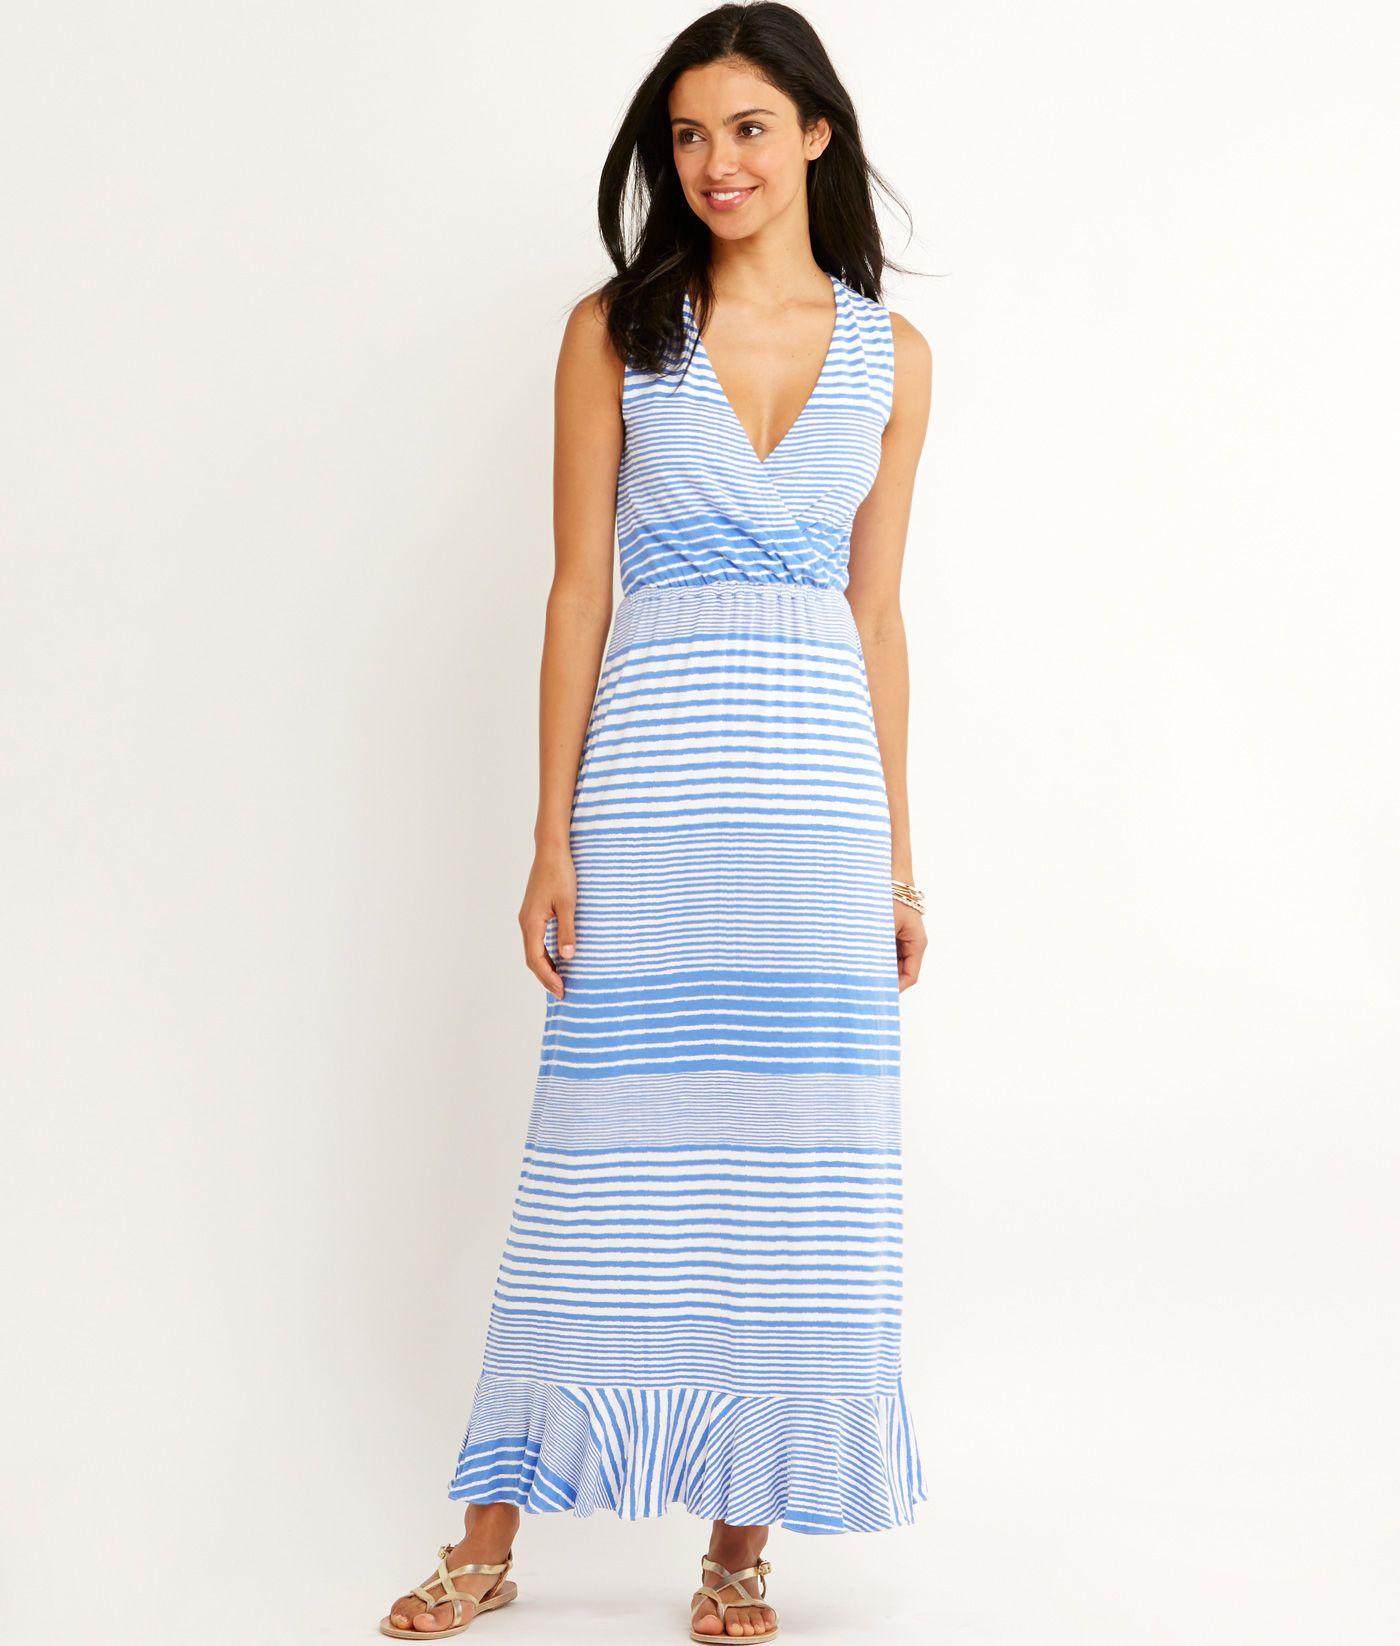 a6c2952286 Shop Windward Stripe Maxi Dress at vineyard vines | Style | Dresses ...